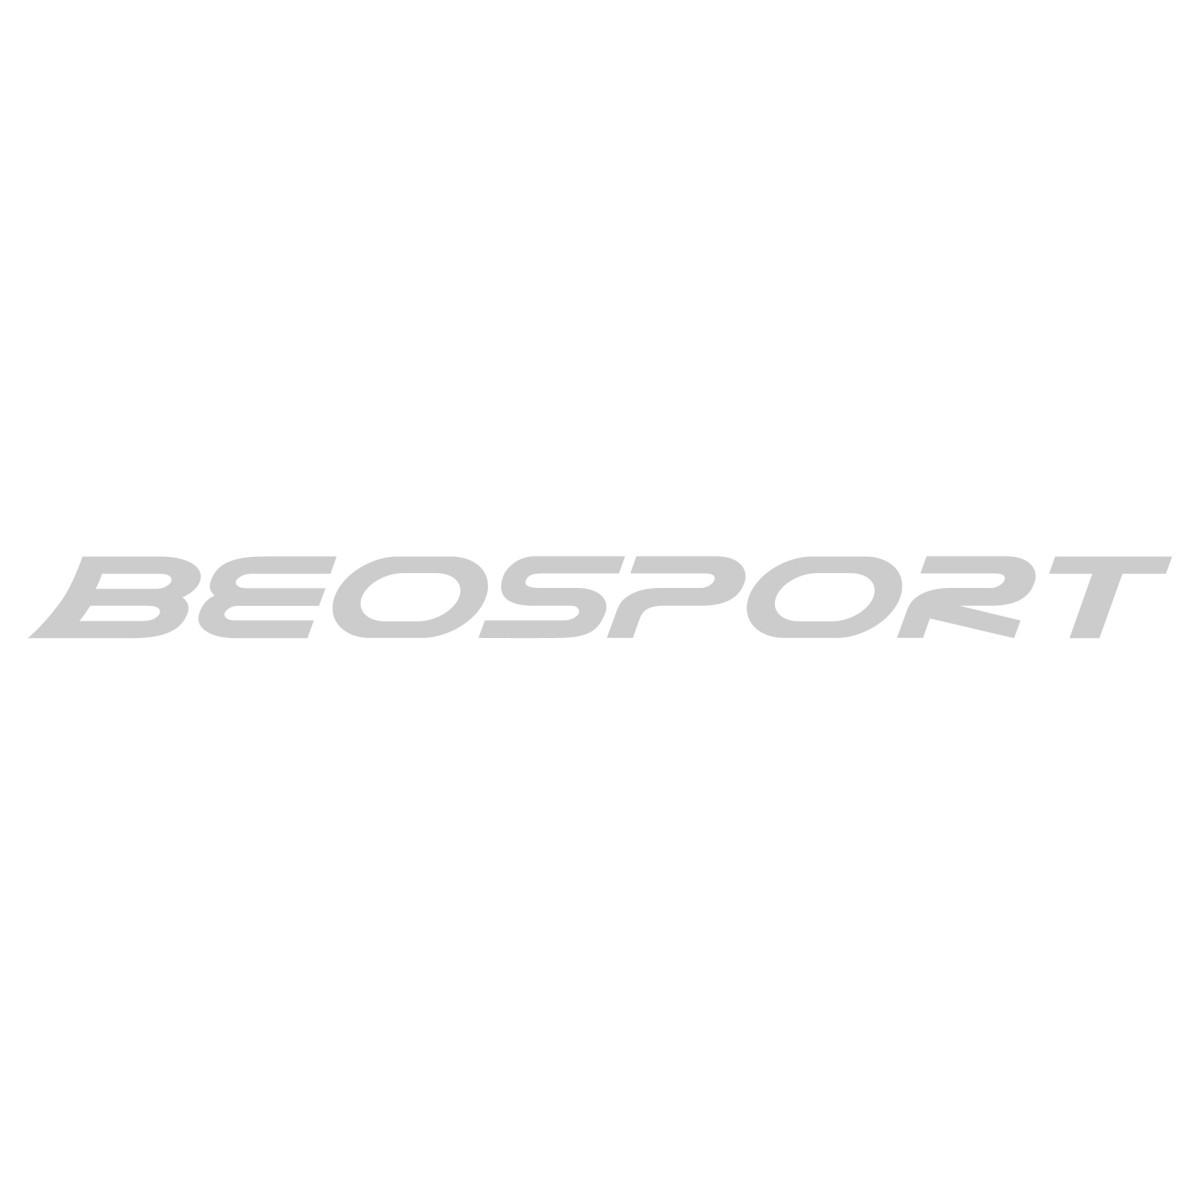 Wilson Championship 3 Ball teniske loptice